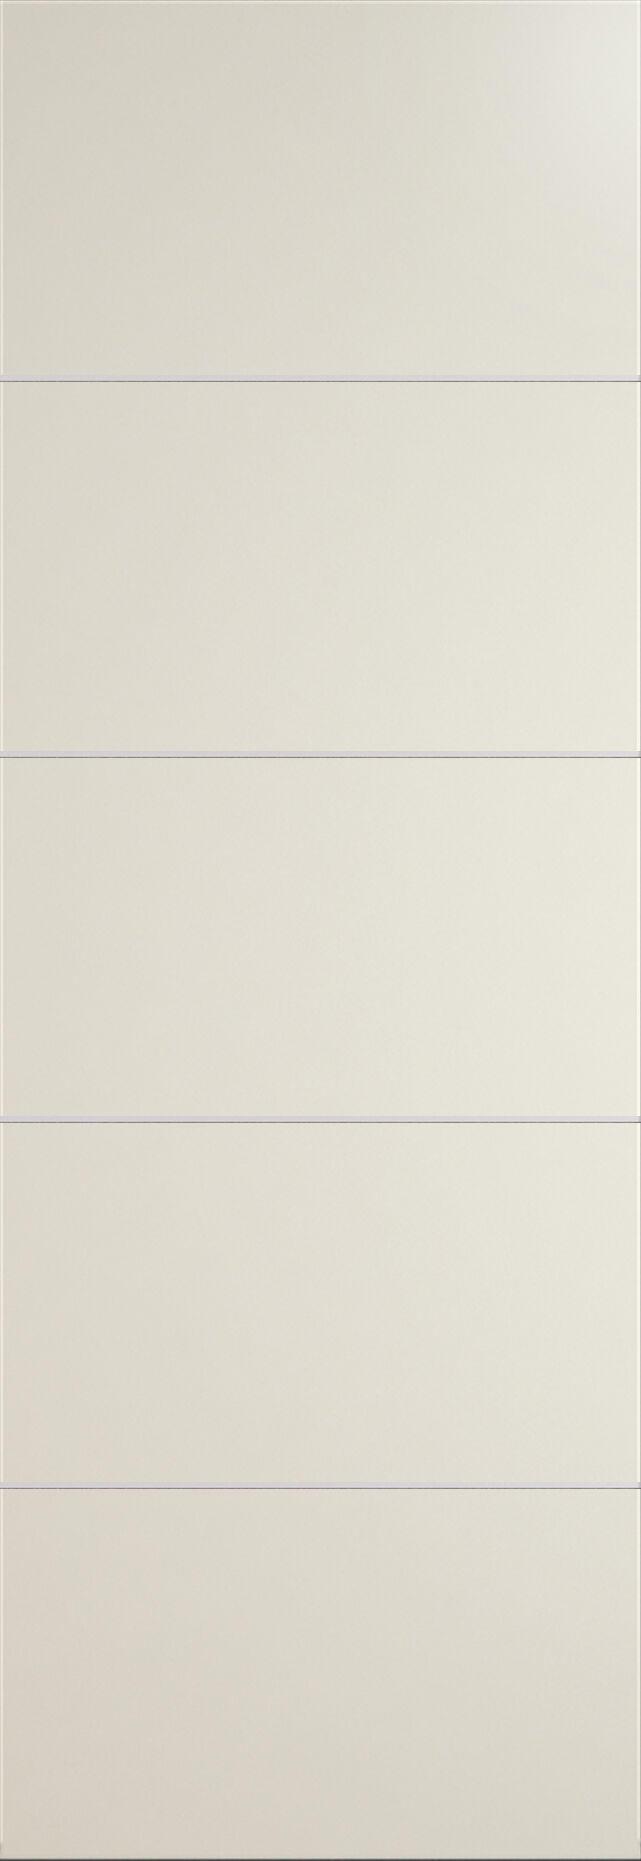 Tivoli Д-3 Invisible цвет - Жемчужная эмаль Без стекла (ДГ)